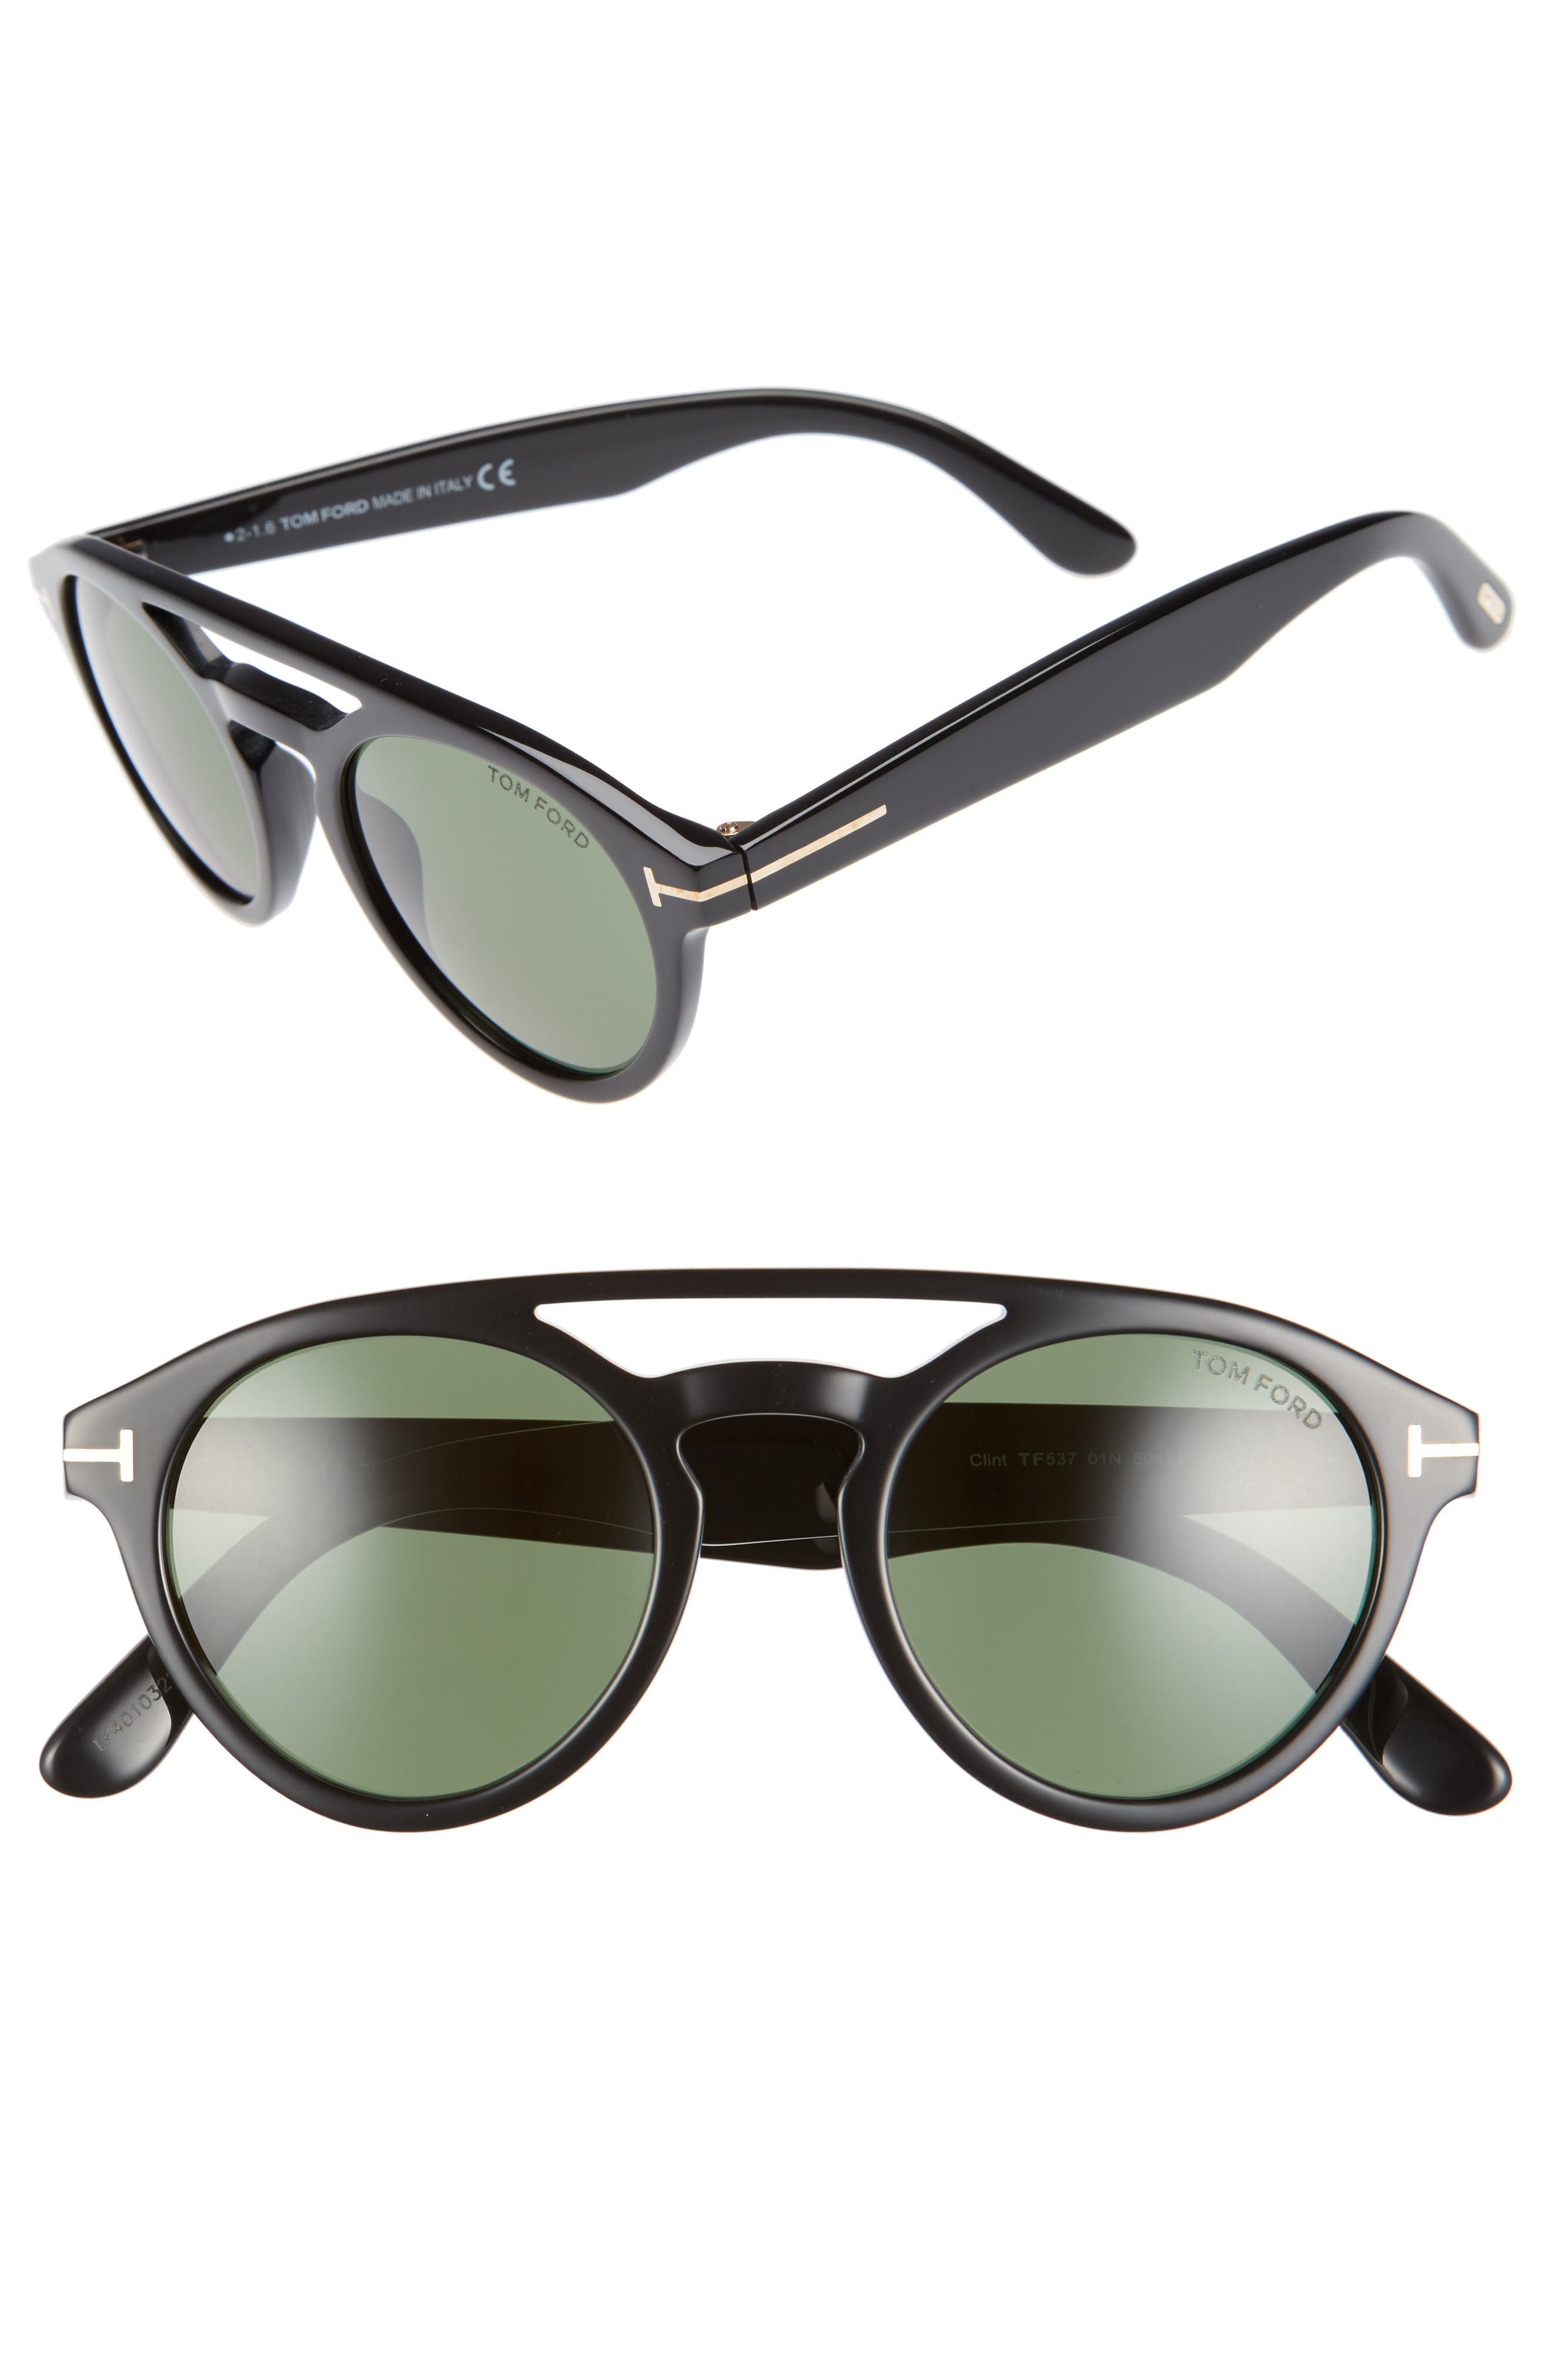 Main Image - Tom Ford Clint 50mm Aviator Sunglasses